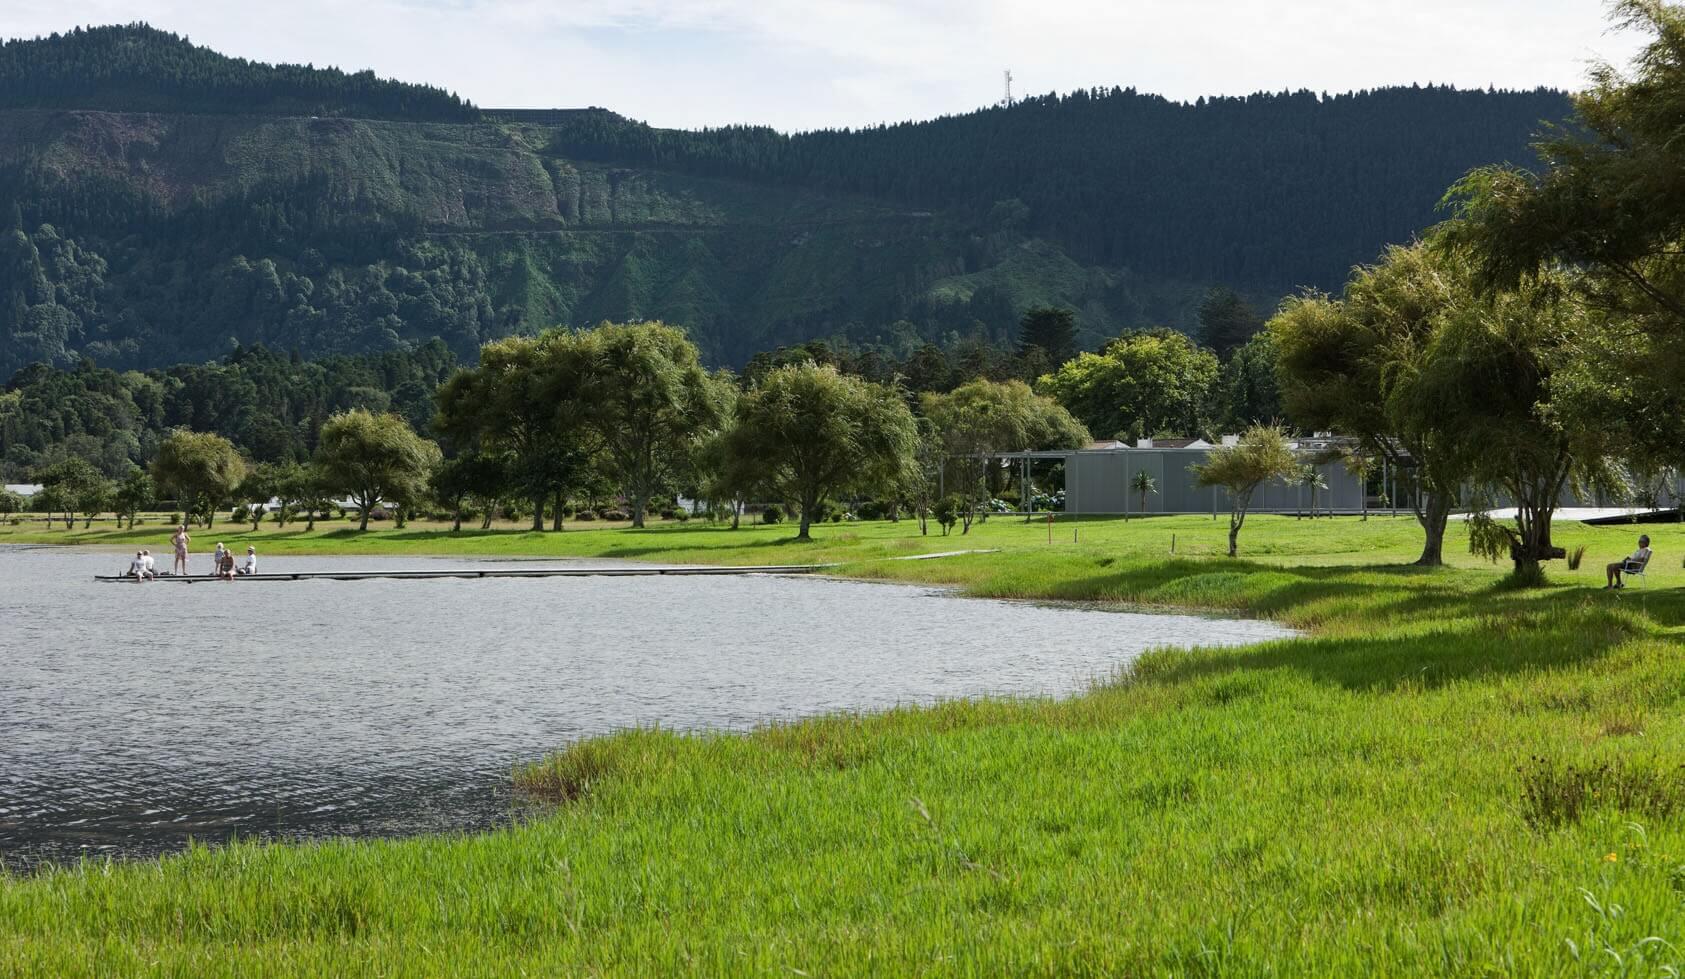 Complexo Ambiental da Lagoa das Sete Cidades